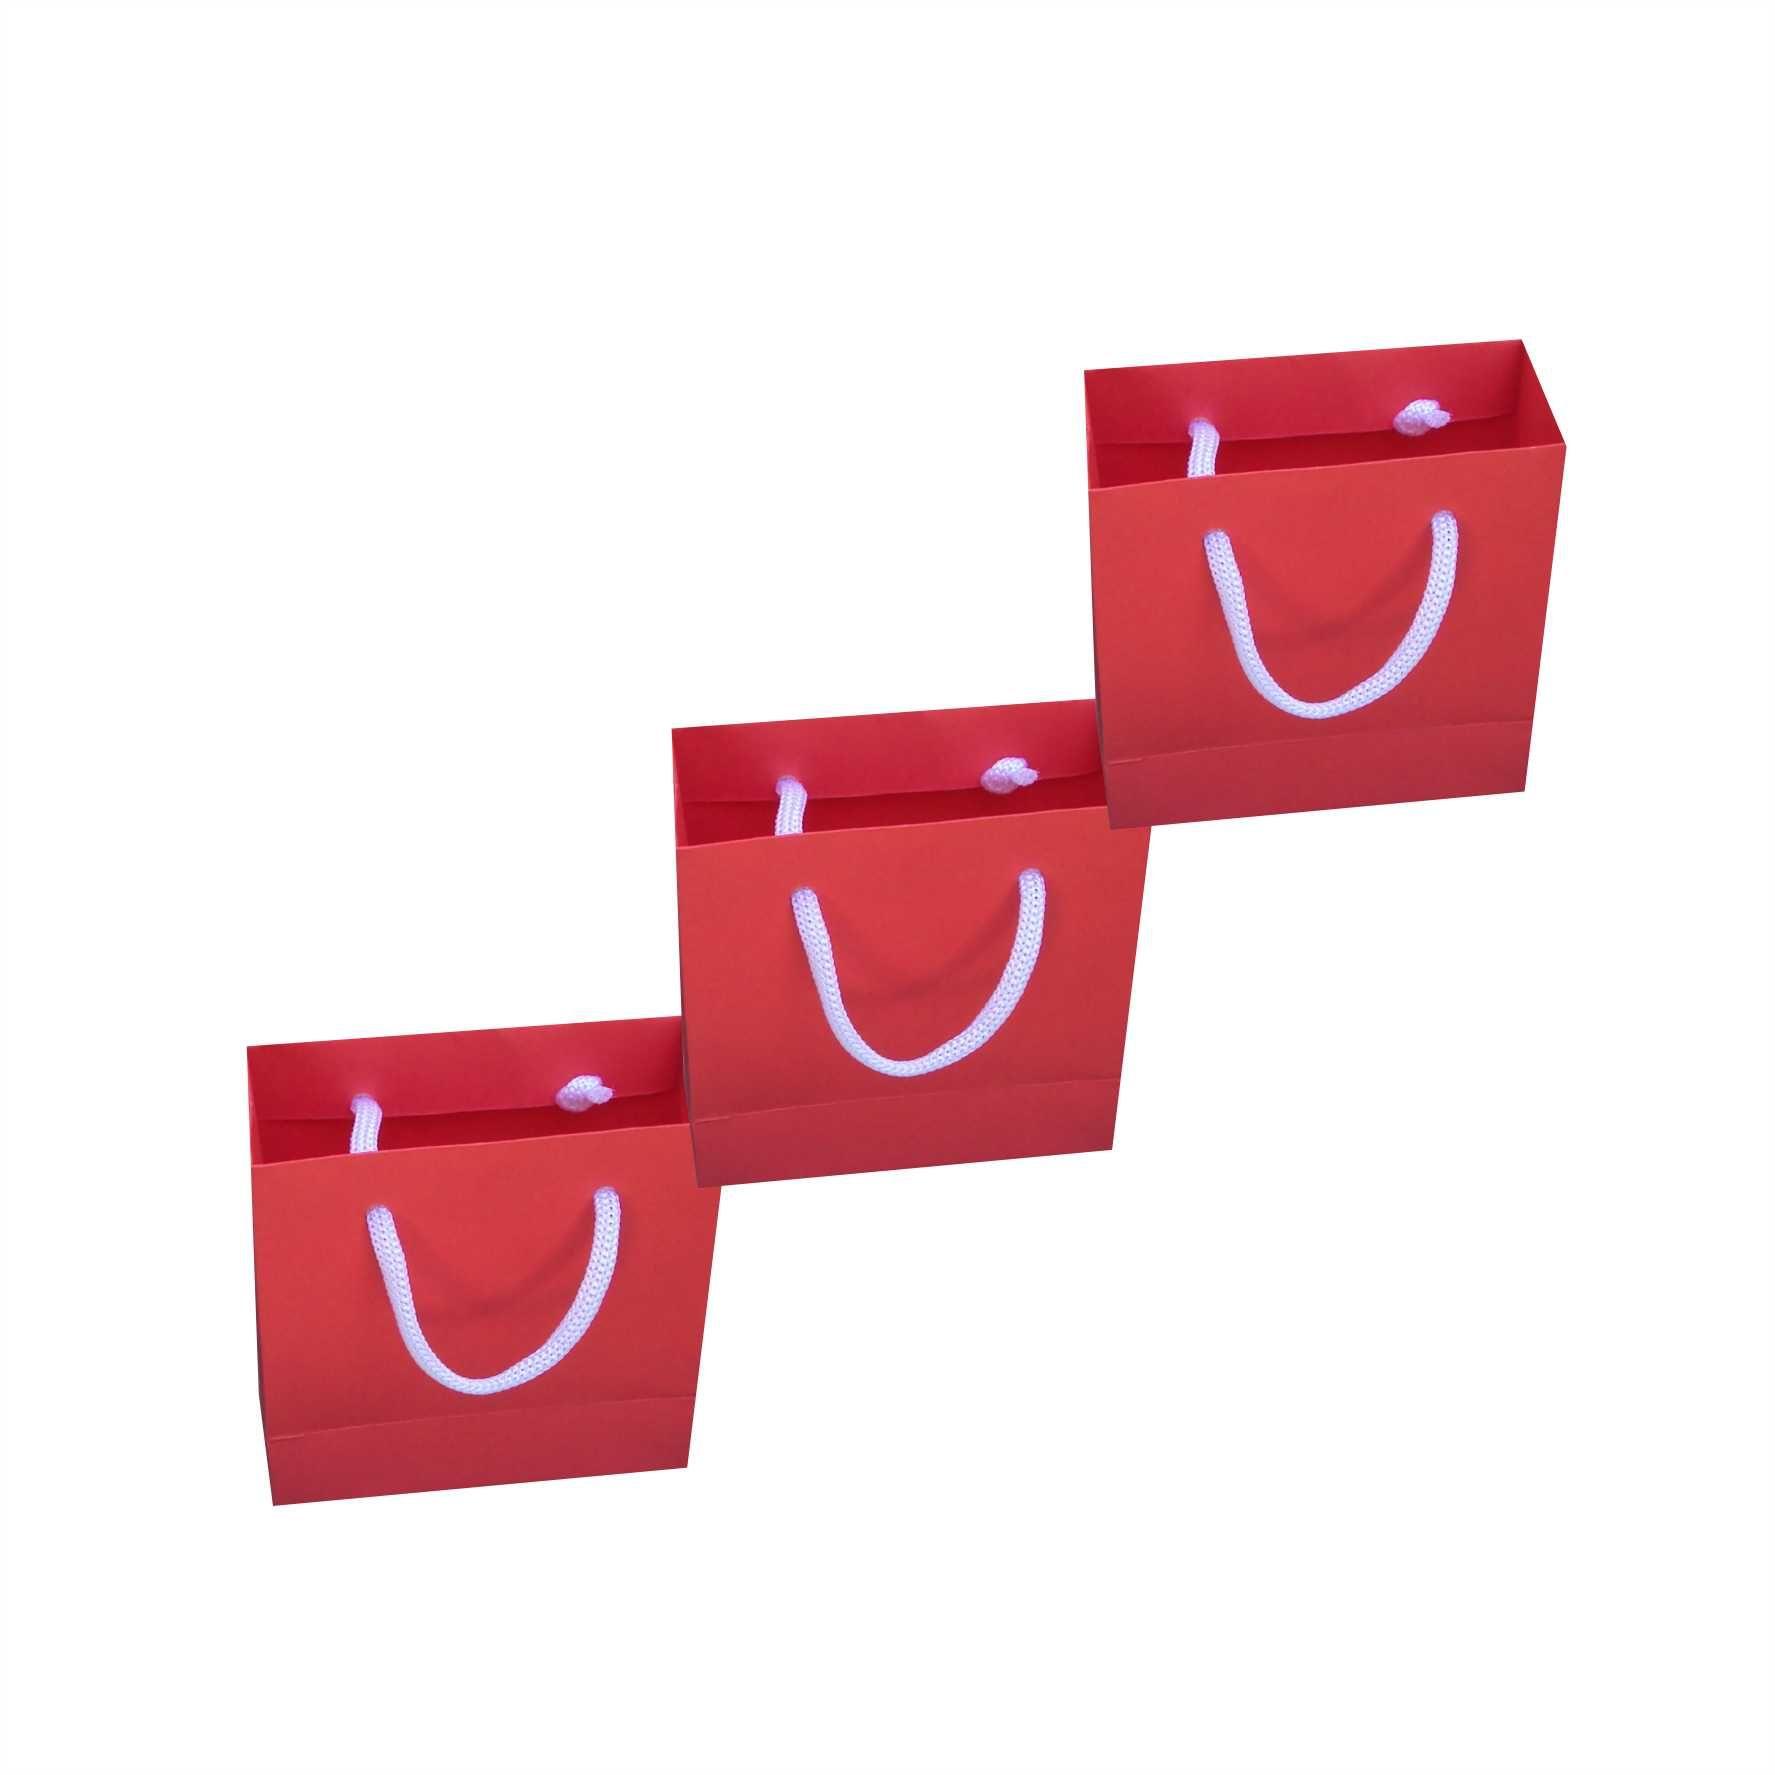 Sacola de papel mini (10x10x4,5 cm) - vermelha - 10 unidades